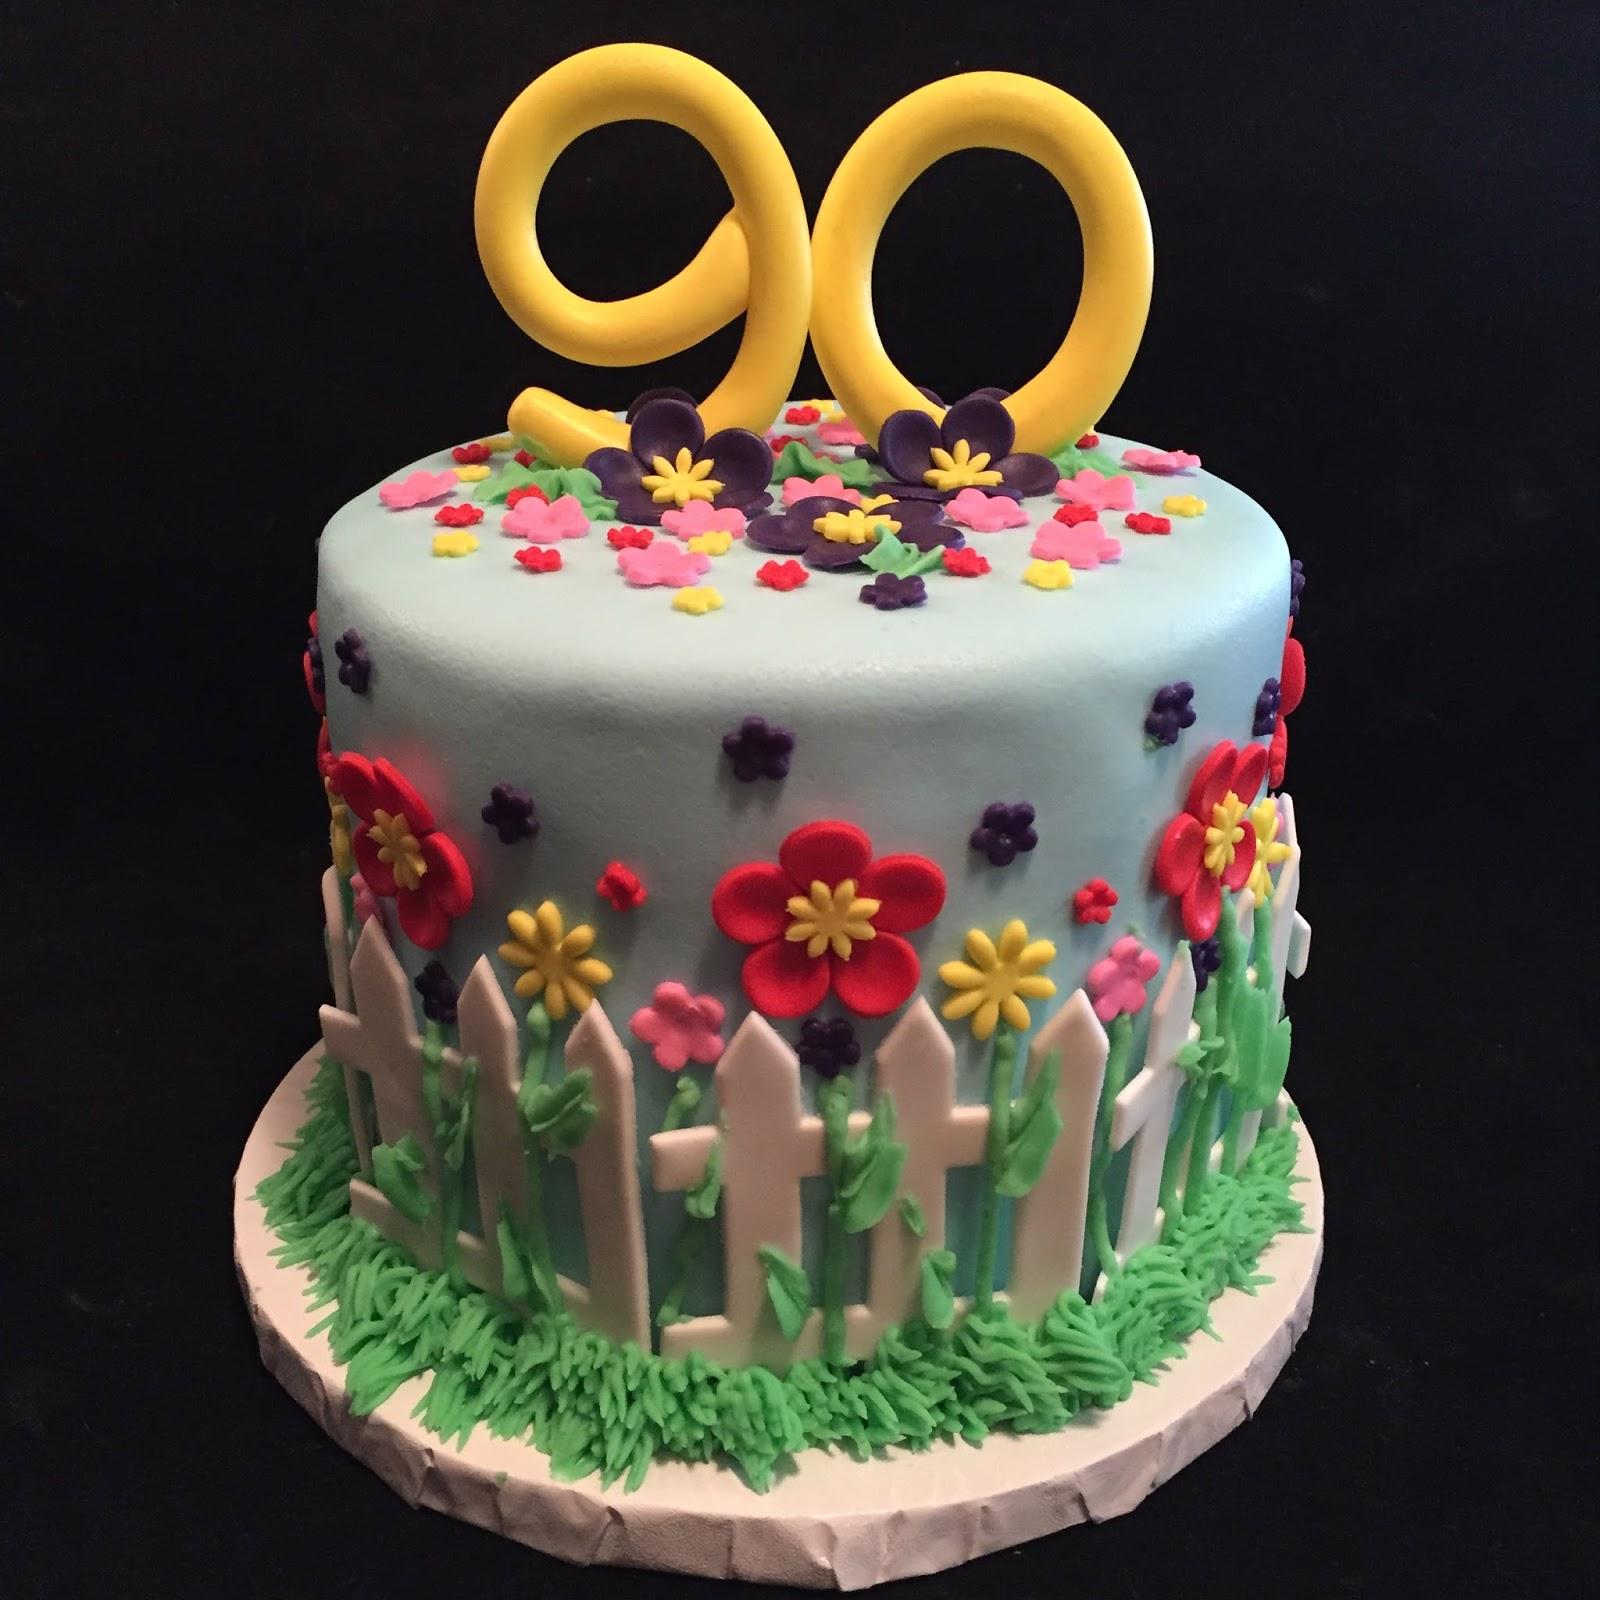 Grandma Joyces 90th Birthday